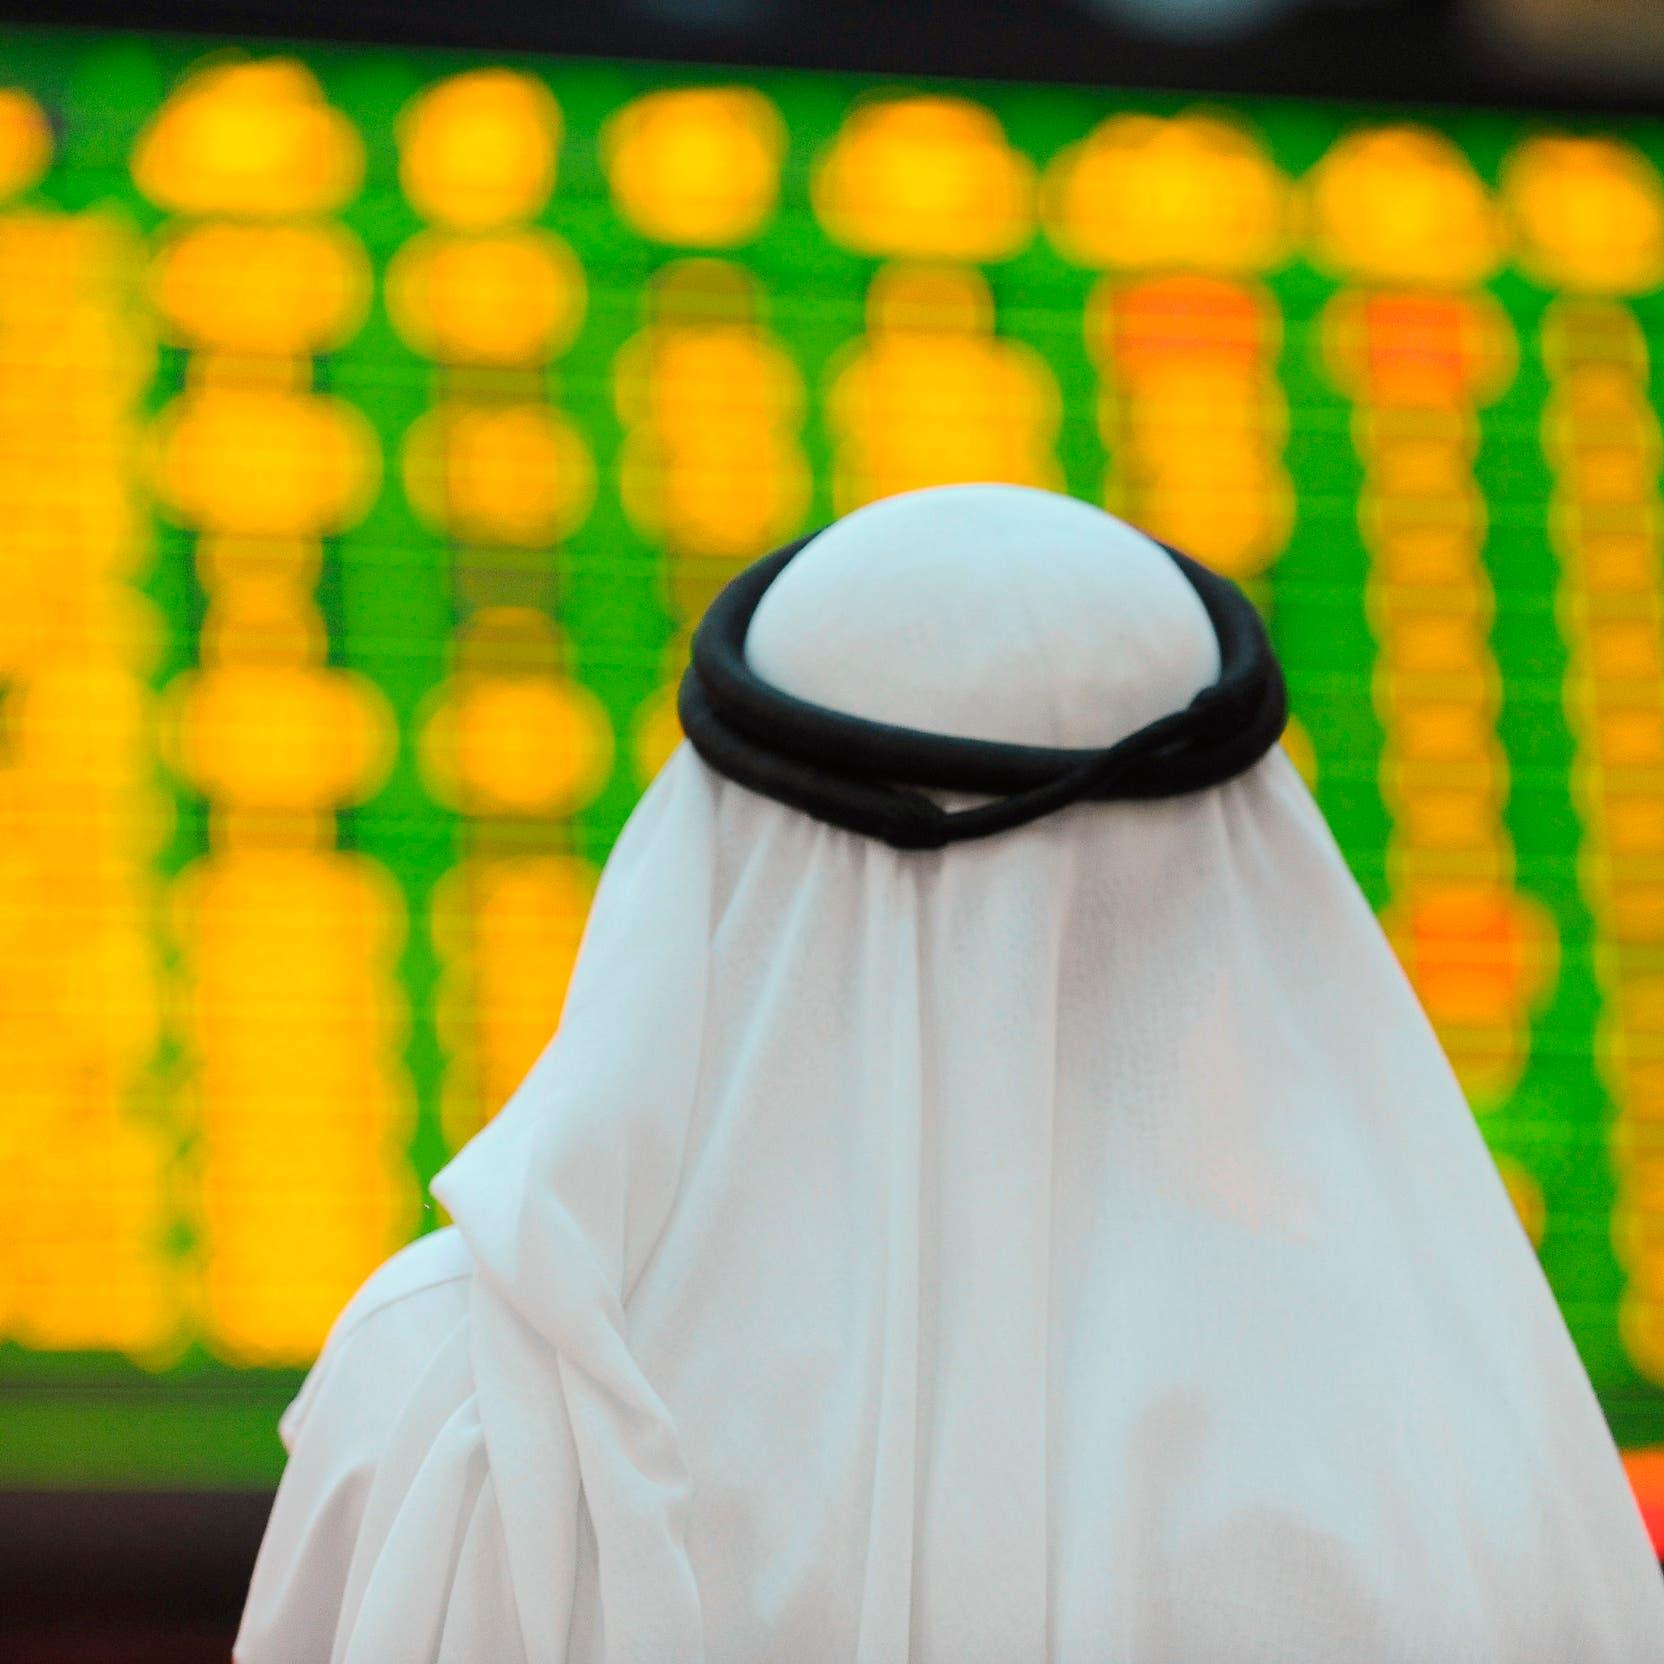 Abu Dhabi shares at record high, shrugging off Israel-Palestine tension